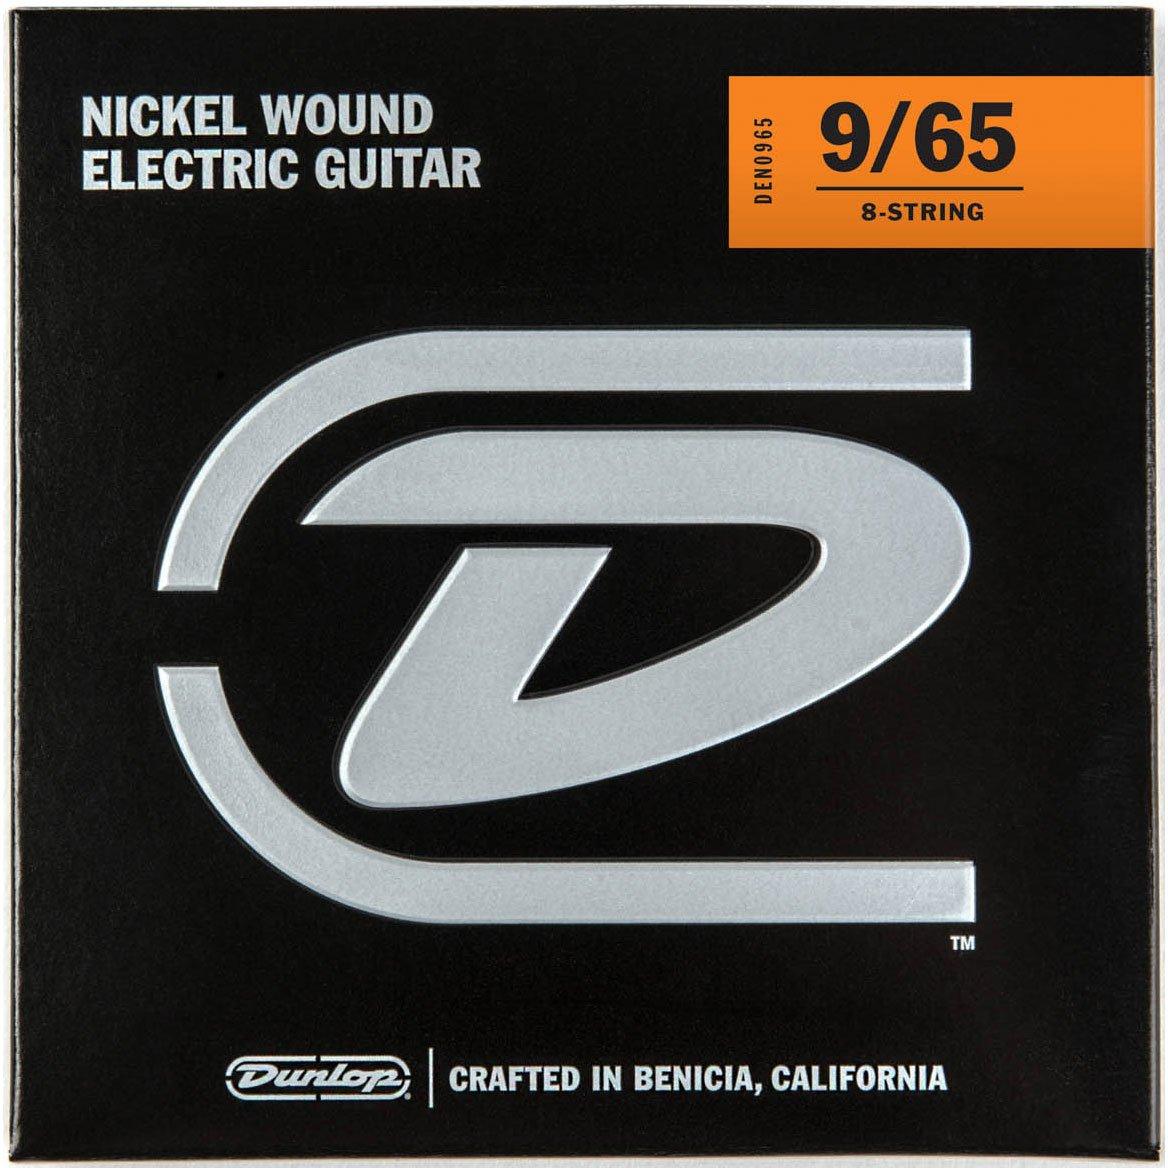 Dunlop DEN0965 Light níquel Wound Cuerdas para guitarra eléctrica (0,09 - 0,65) 8-strings: Amazon.es: Instrumentos musicales